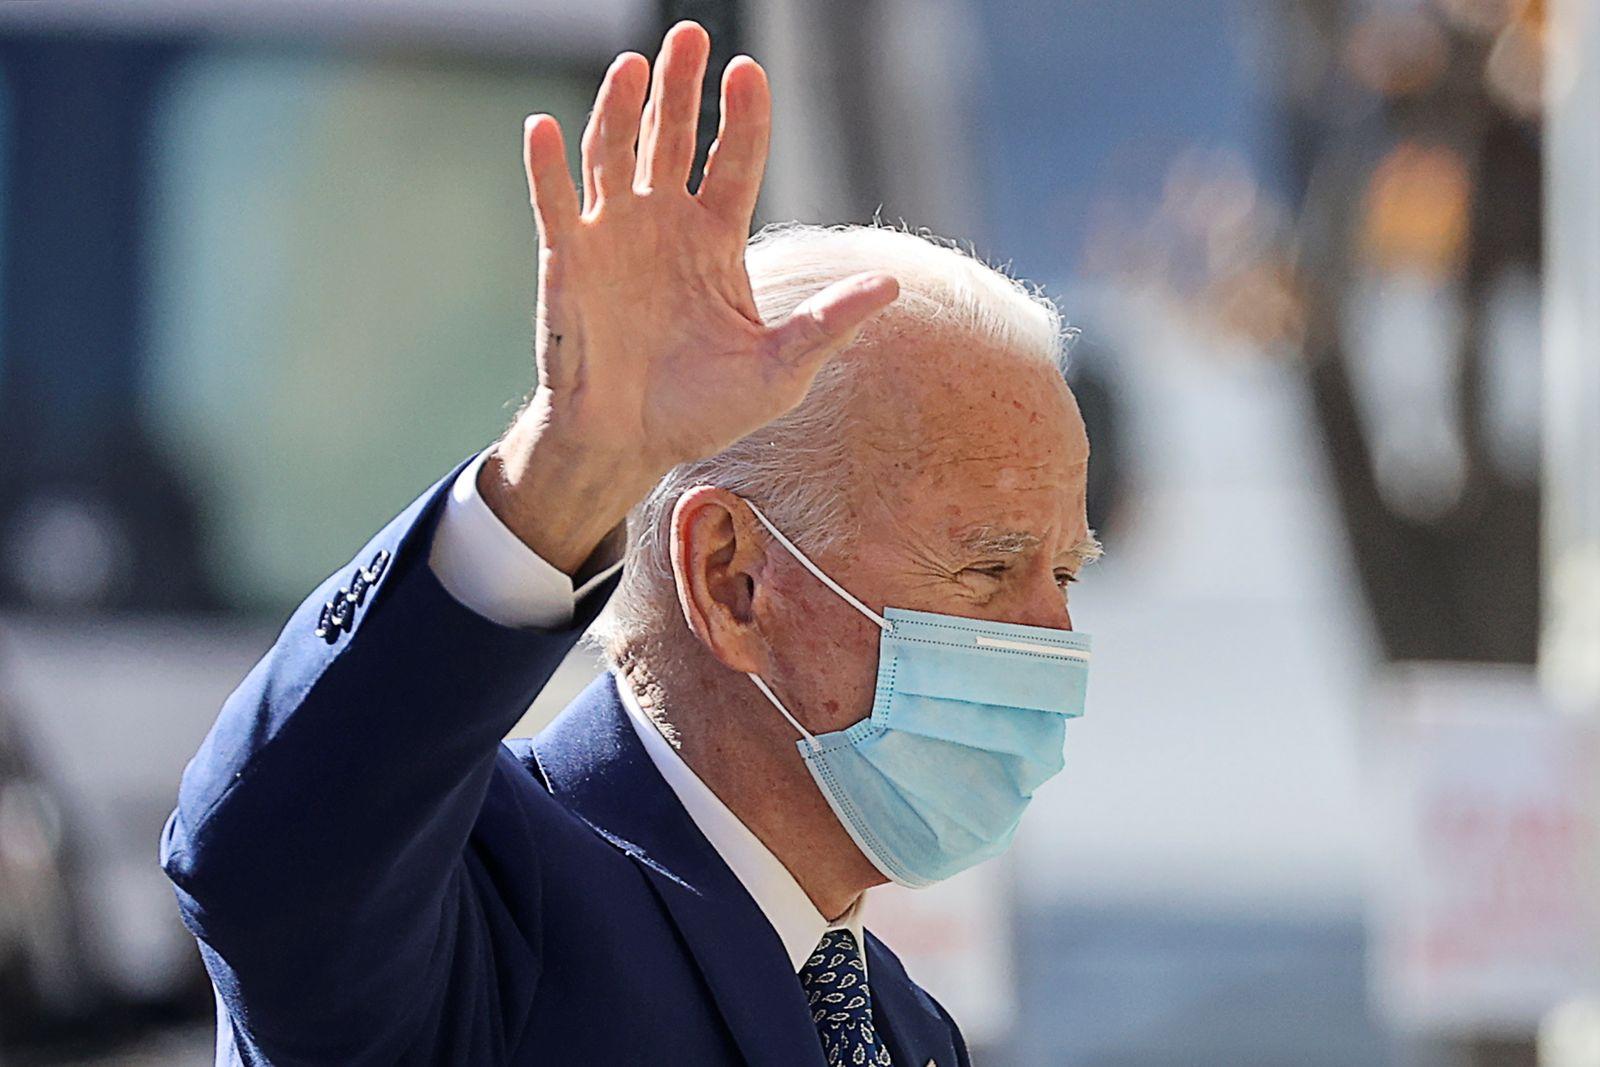 U.S. President-elect Biden waves to reporters prior to attending coronavirus briefing in Wilmington, Delaware